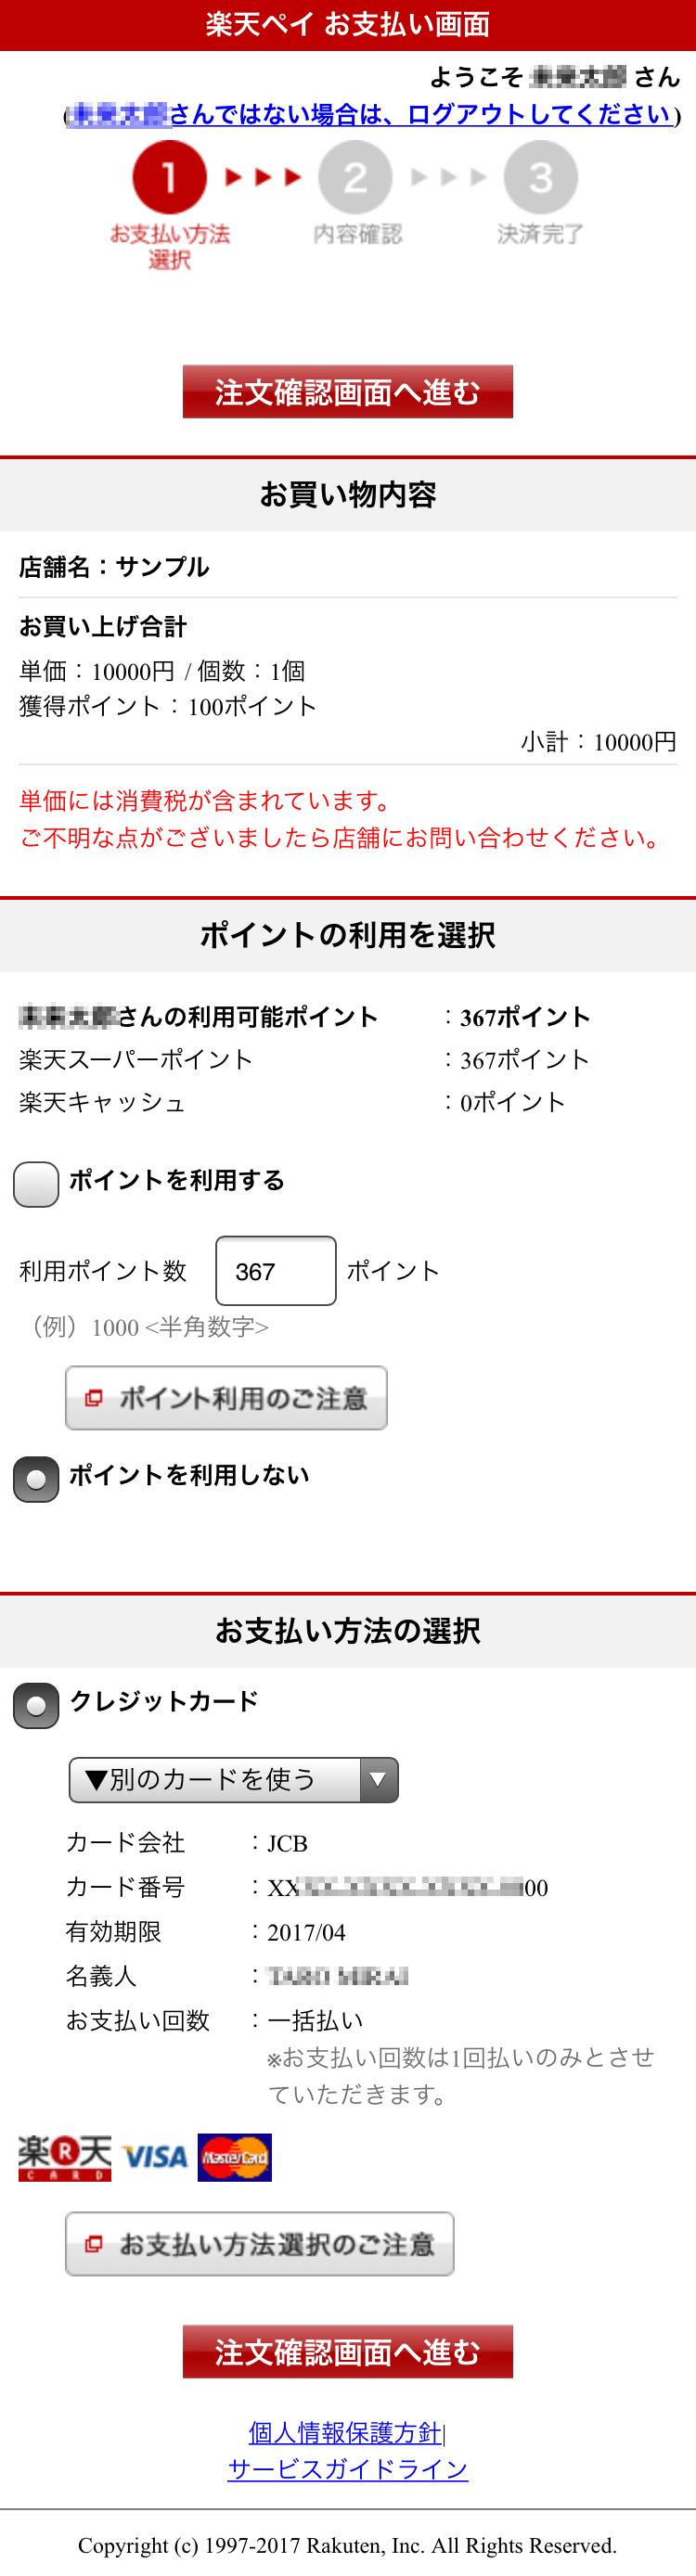 RPayお支払いステップ4